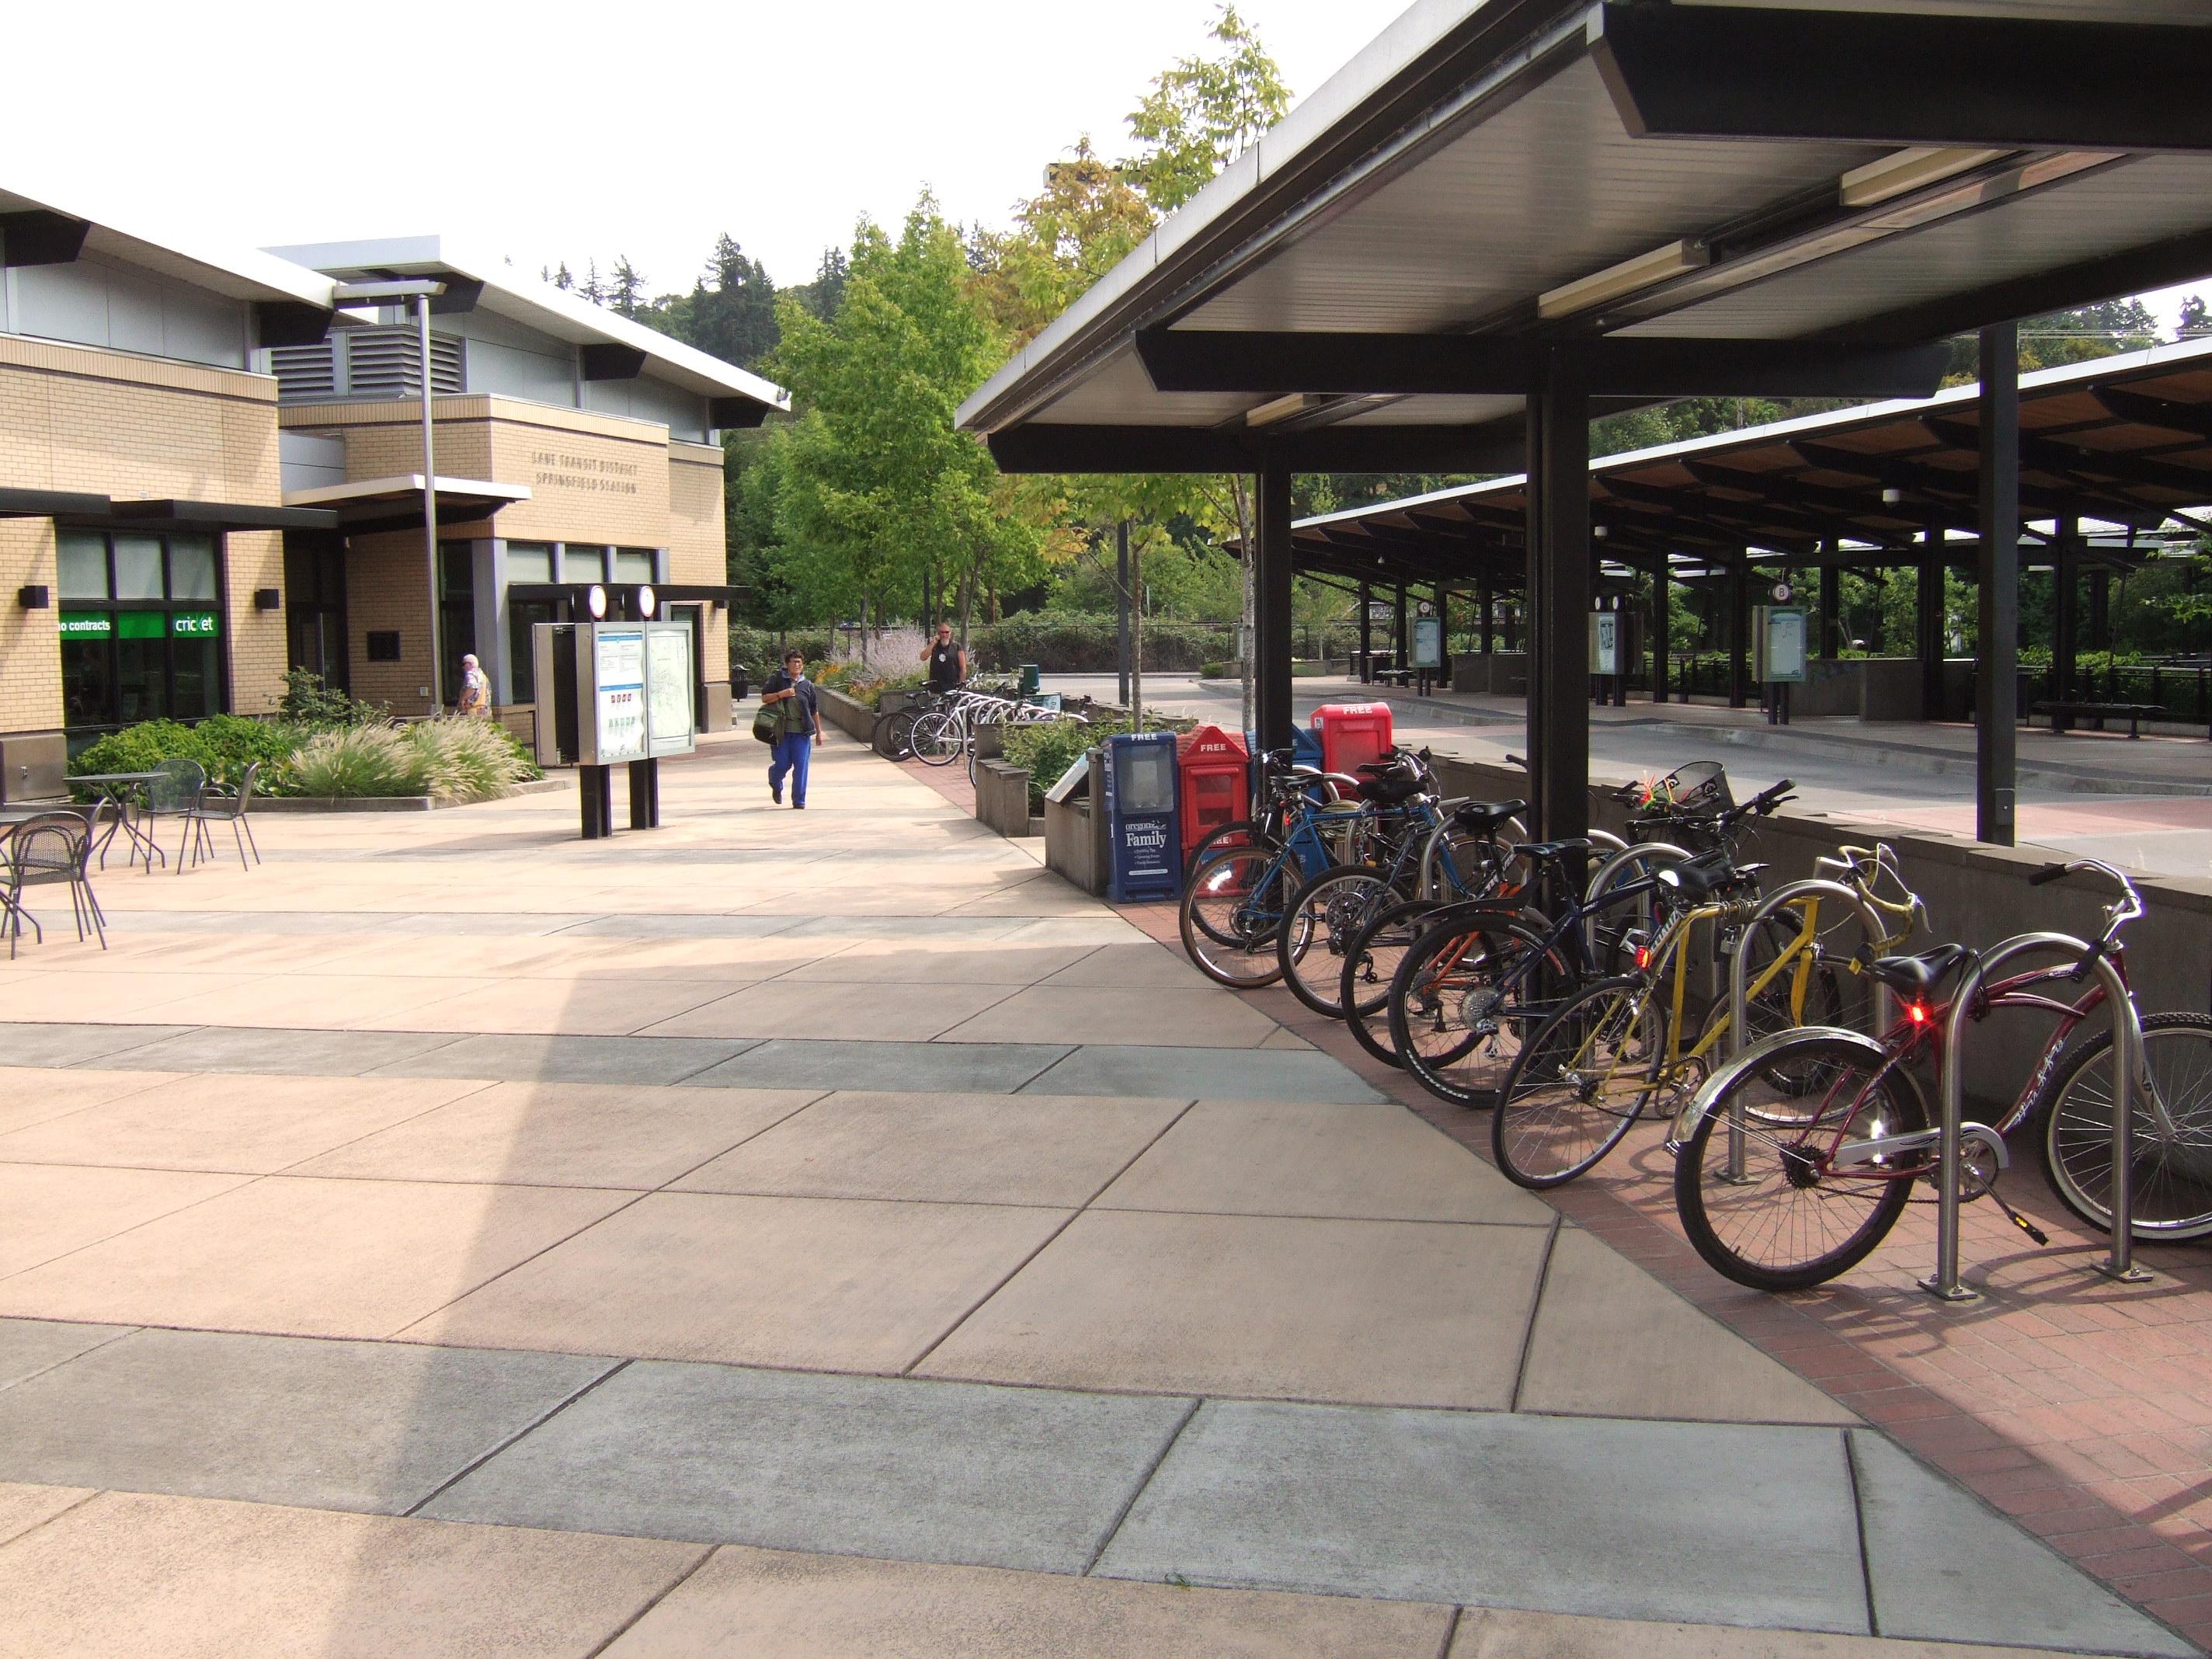 bikeparkingatltdspringfieldstation